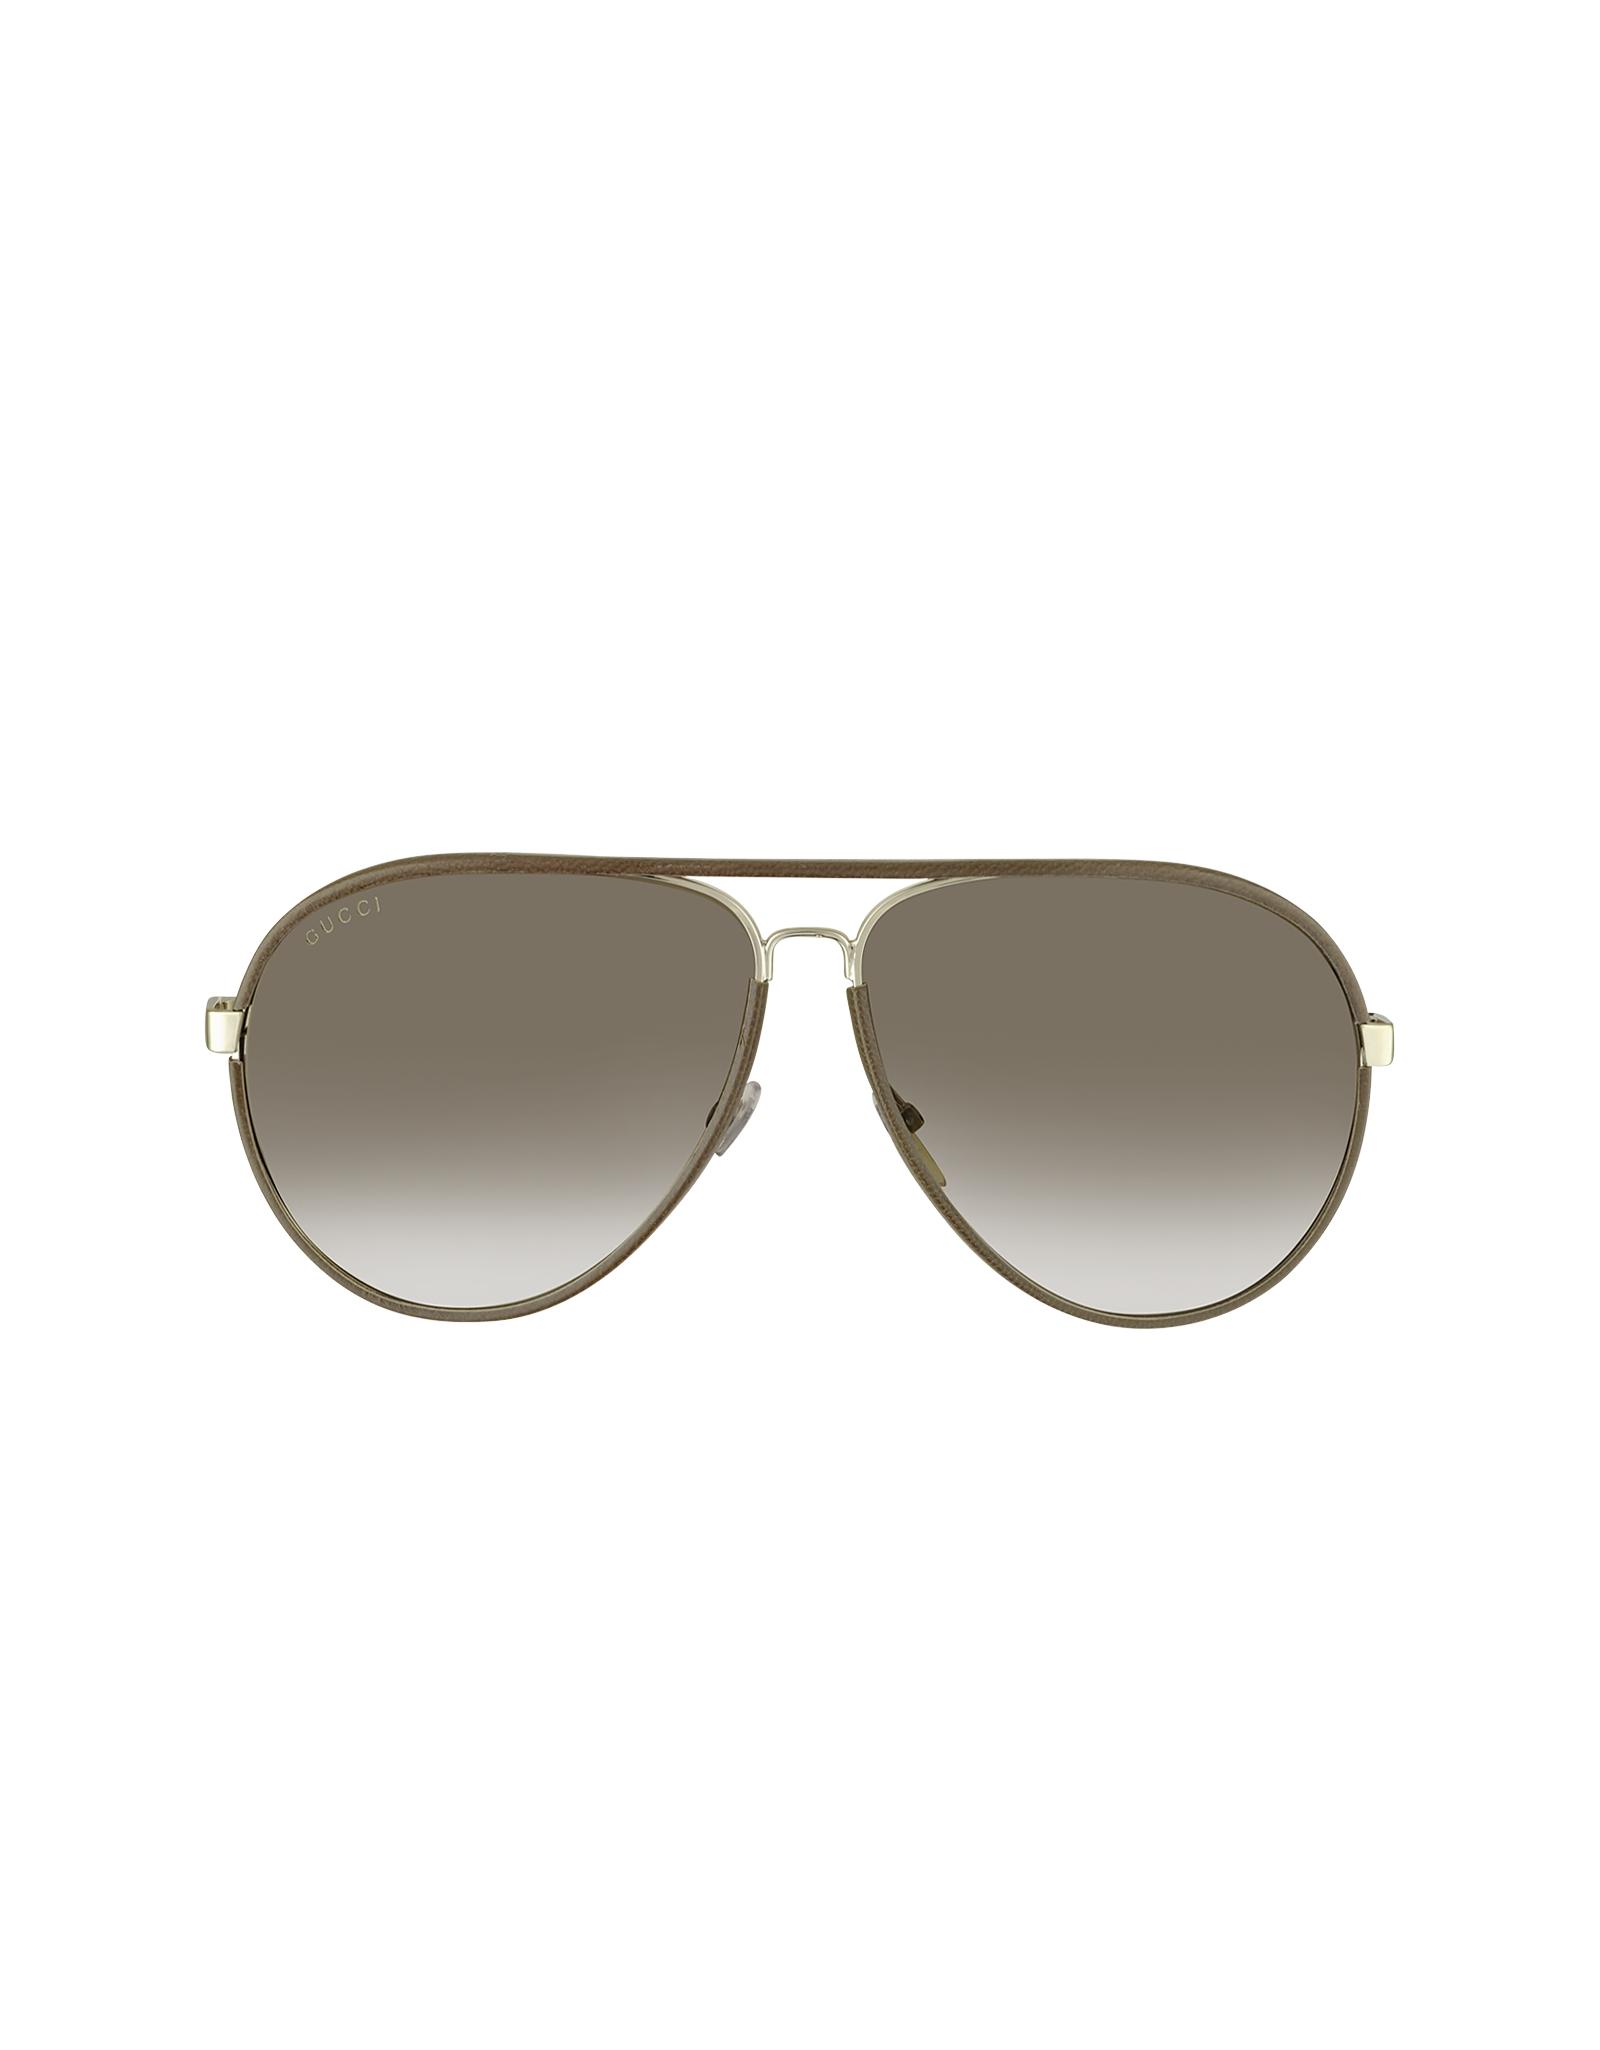 Gucci Sunglasses Leather Frame Aviator : Gucci Mens Logo Leather Aviator Sunglasses in Brown for ...